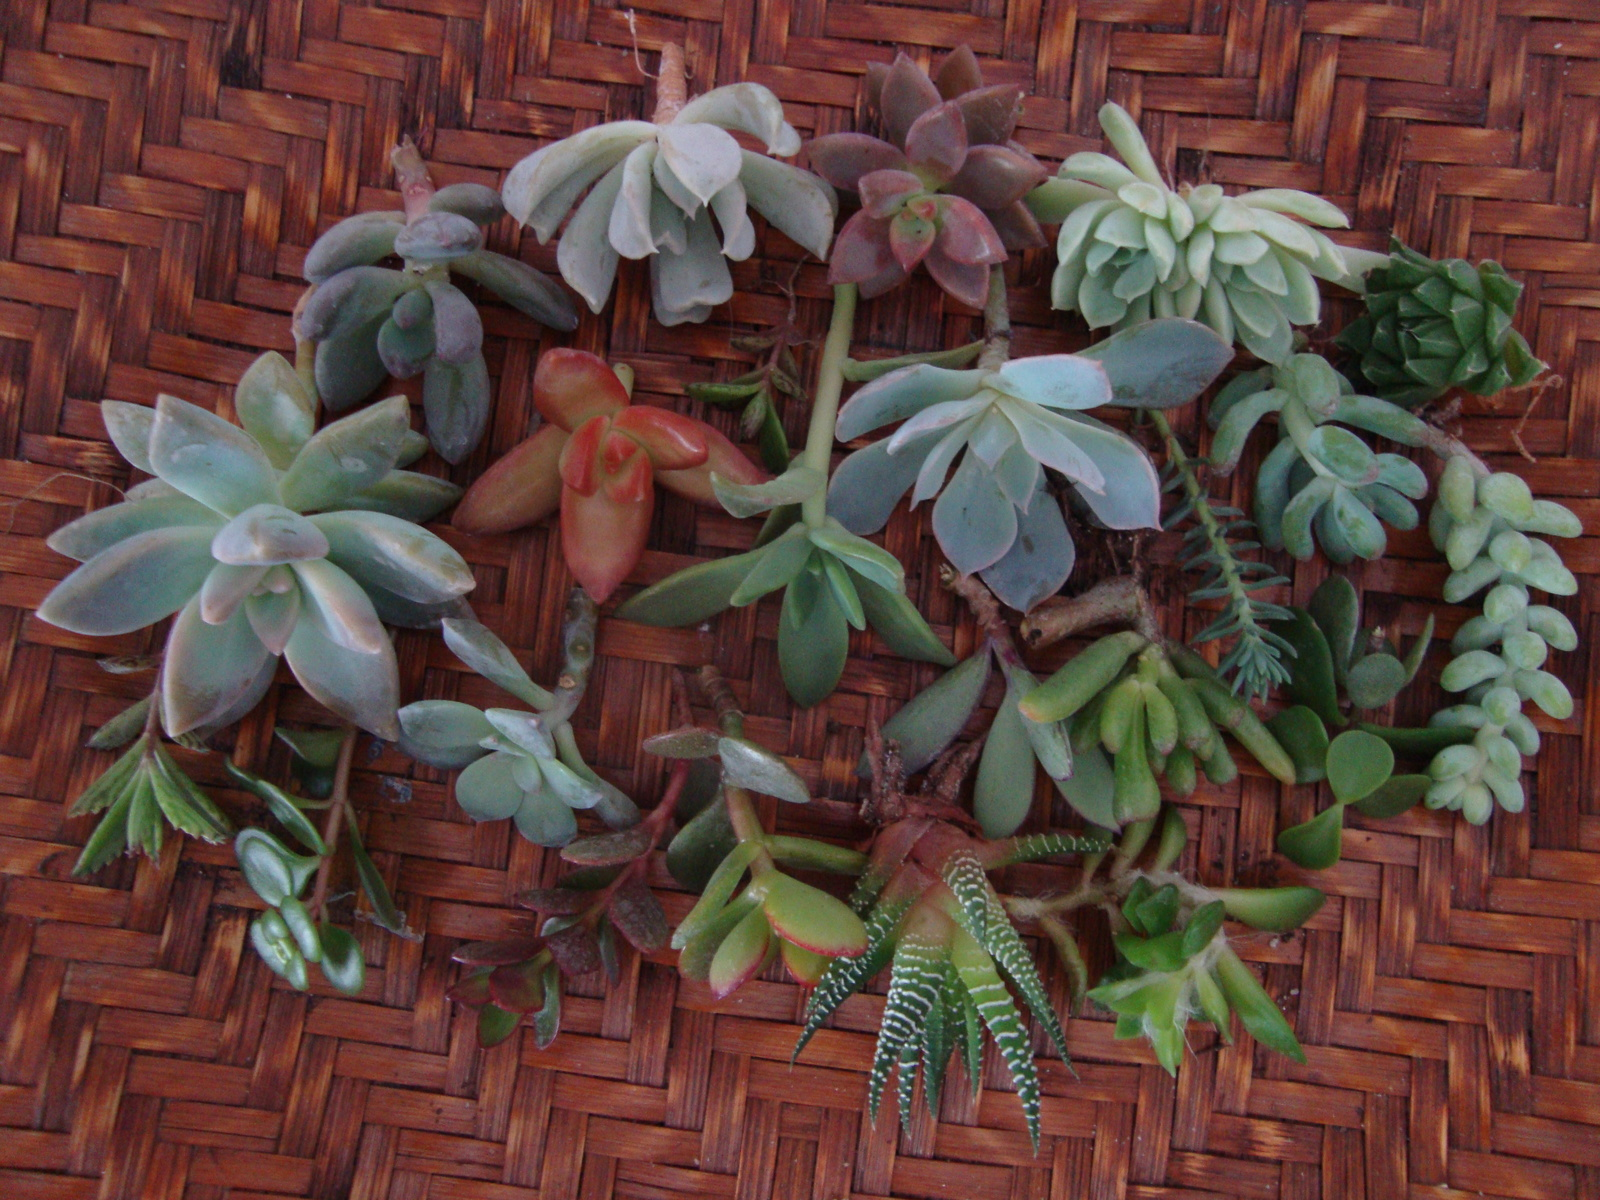 25 Assorted Succulent Cuttings - Wedding, Guest Favors, Terrarium, Cakes, Garden - $25.00